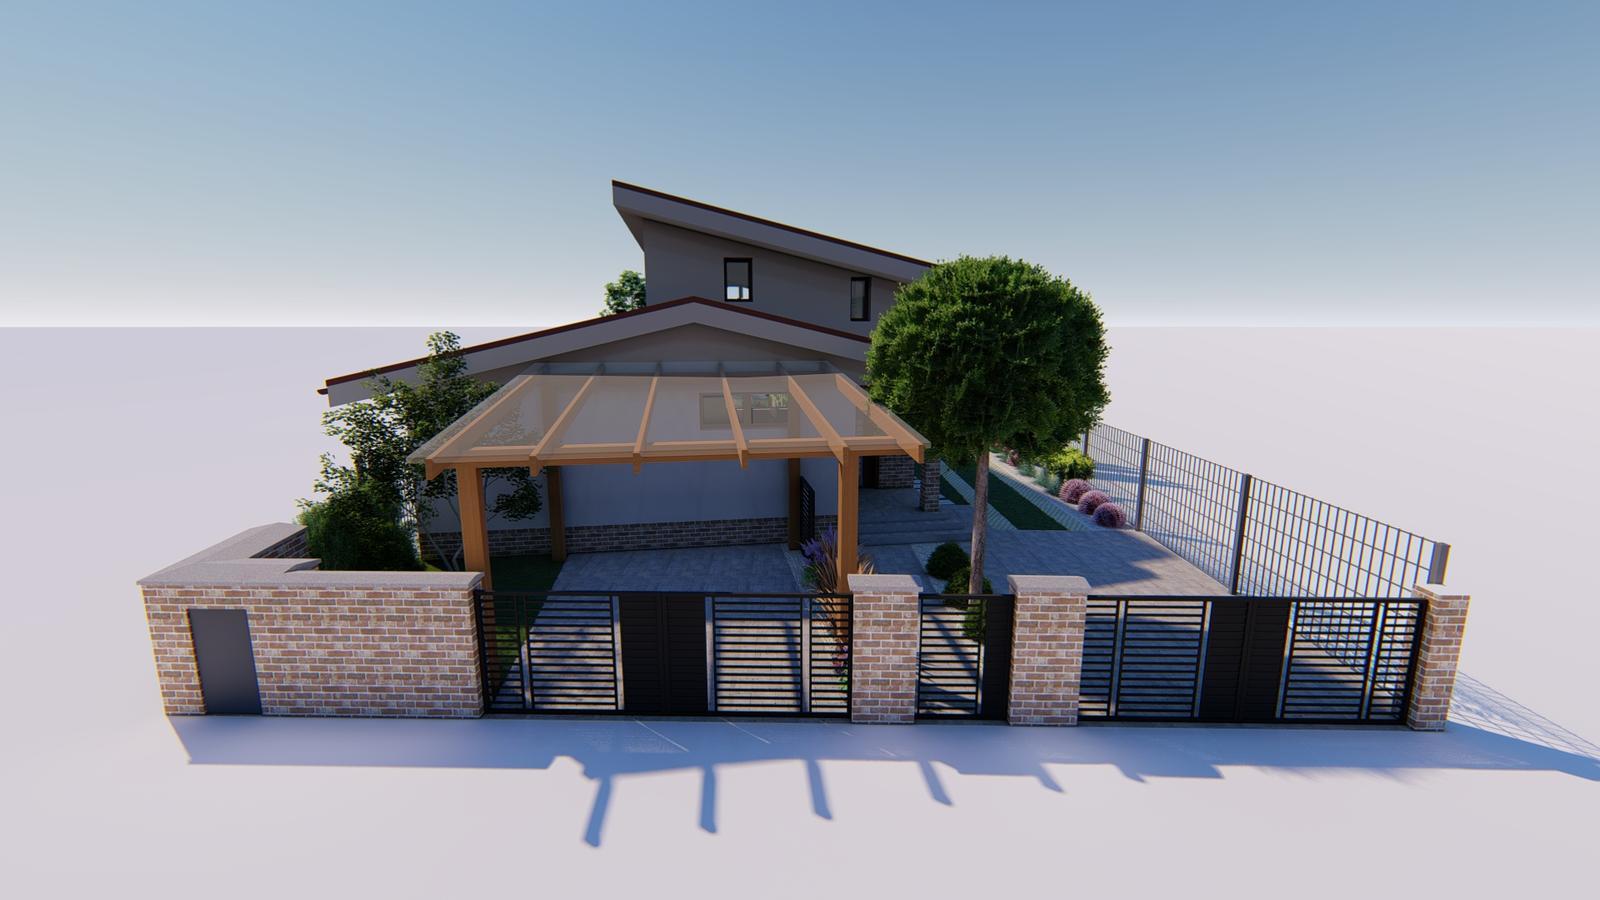 Návrh záhrady rodinného domu. - Obrázok č. 2